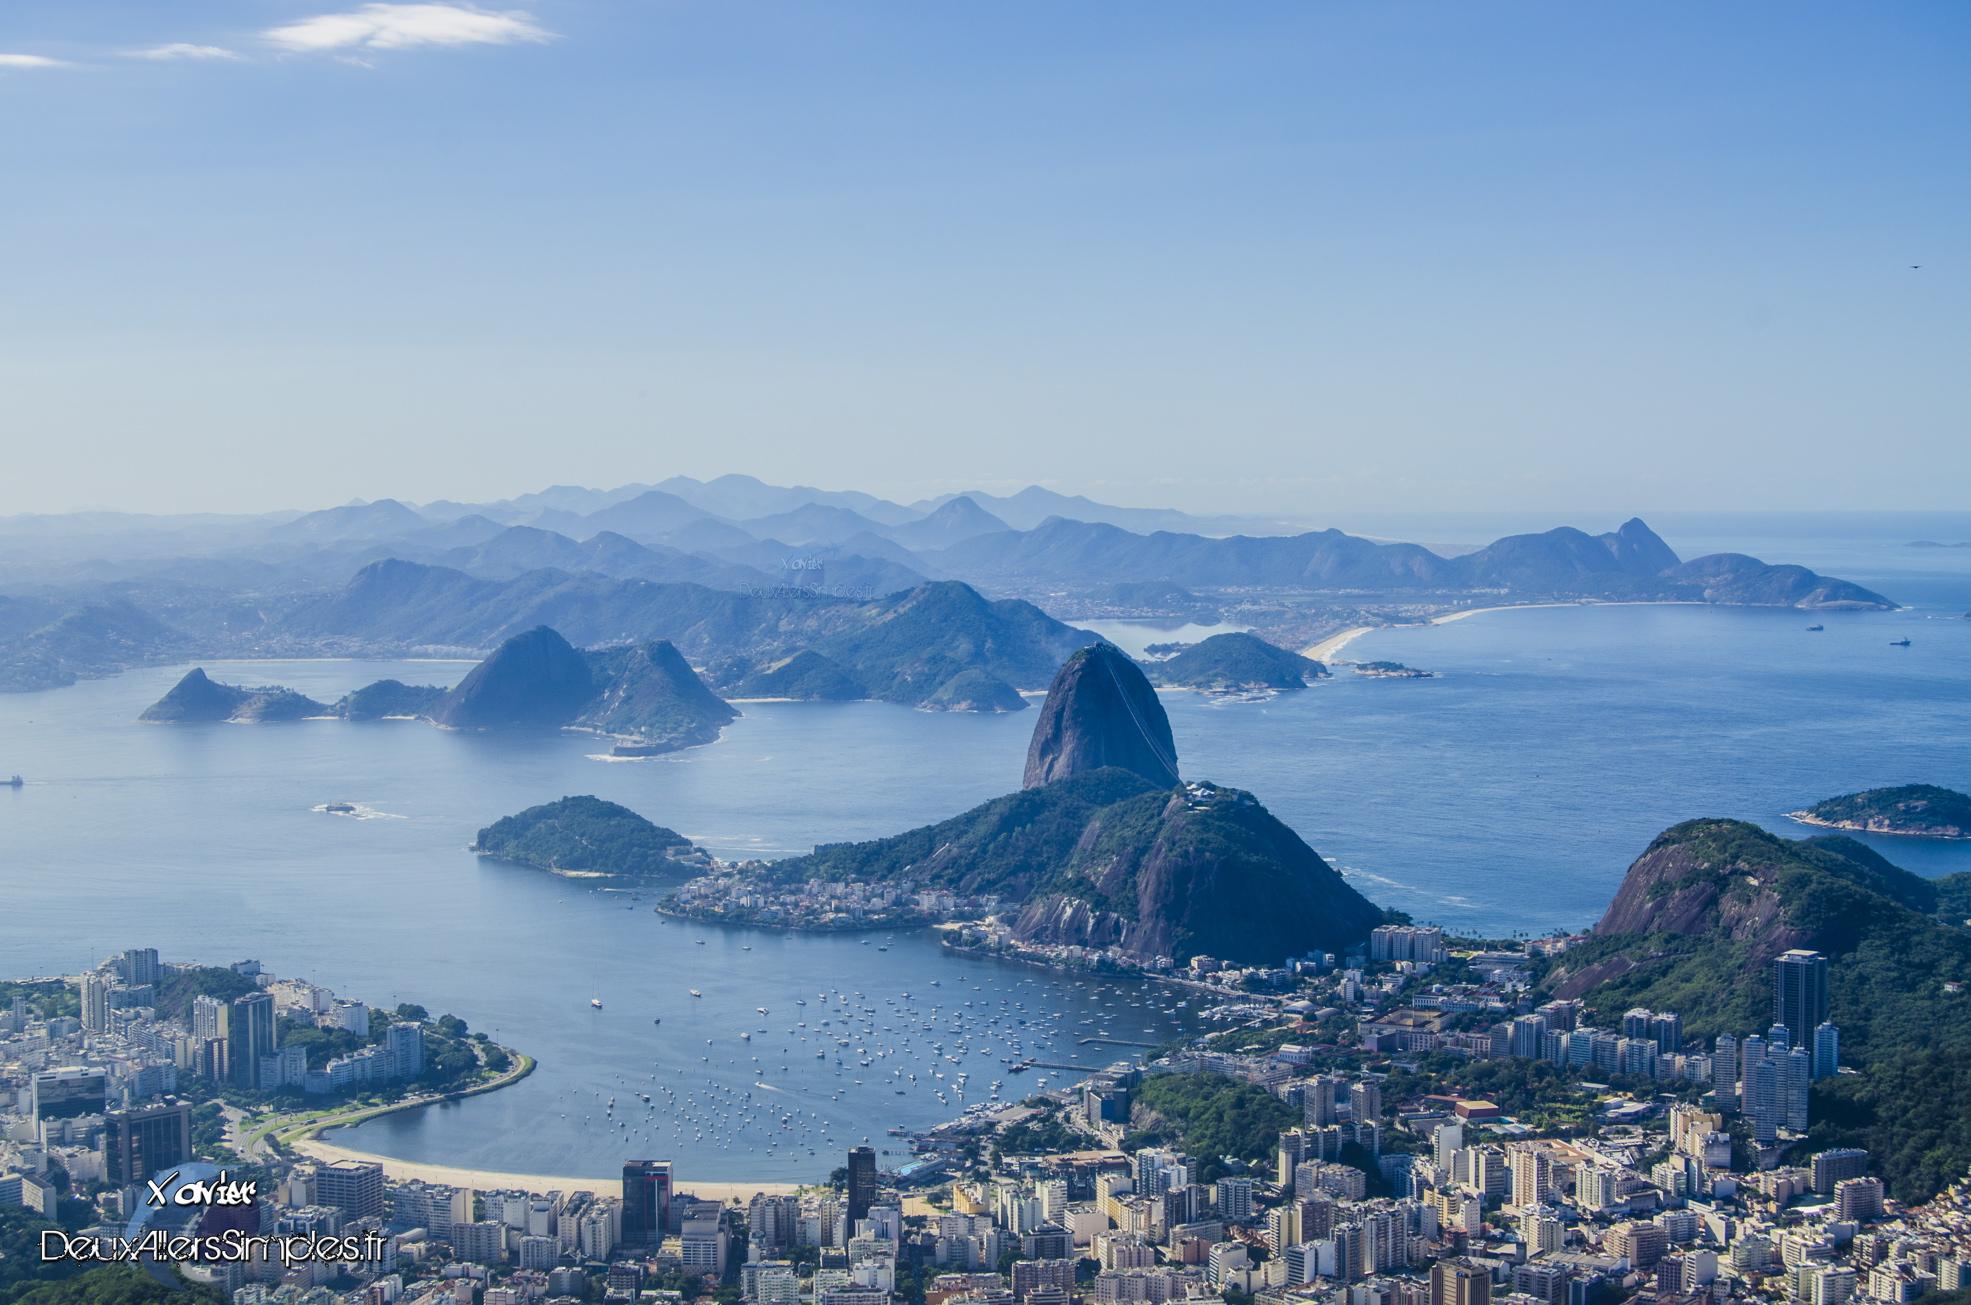 Vue-Panoramique-du-Corcovado-sur-Copacabana-Rio-de-Janeiro